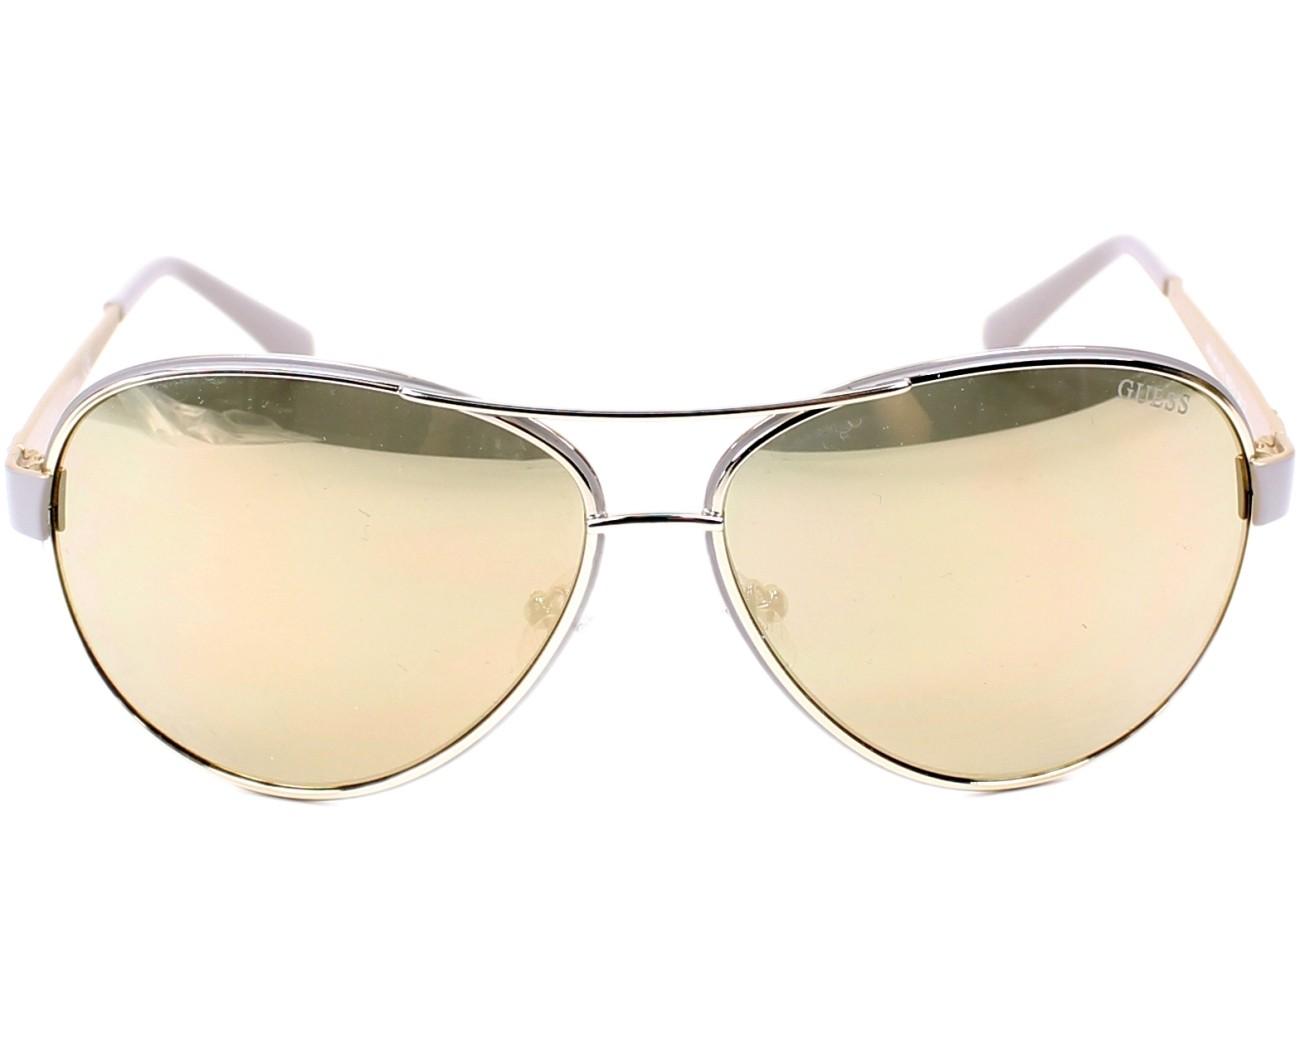 Guess GU7443 Sonnenbrille Grau und Silber 57C 60mm 3hk0ya